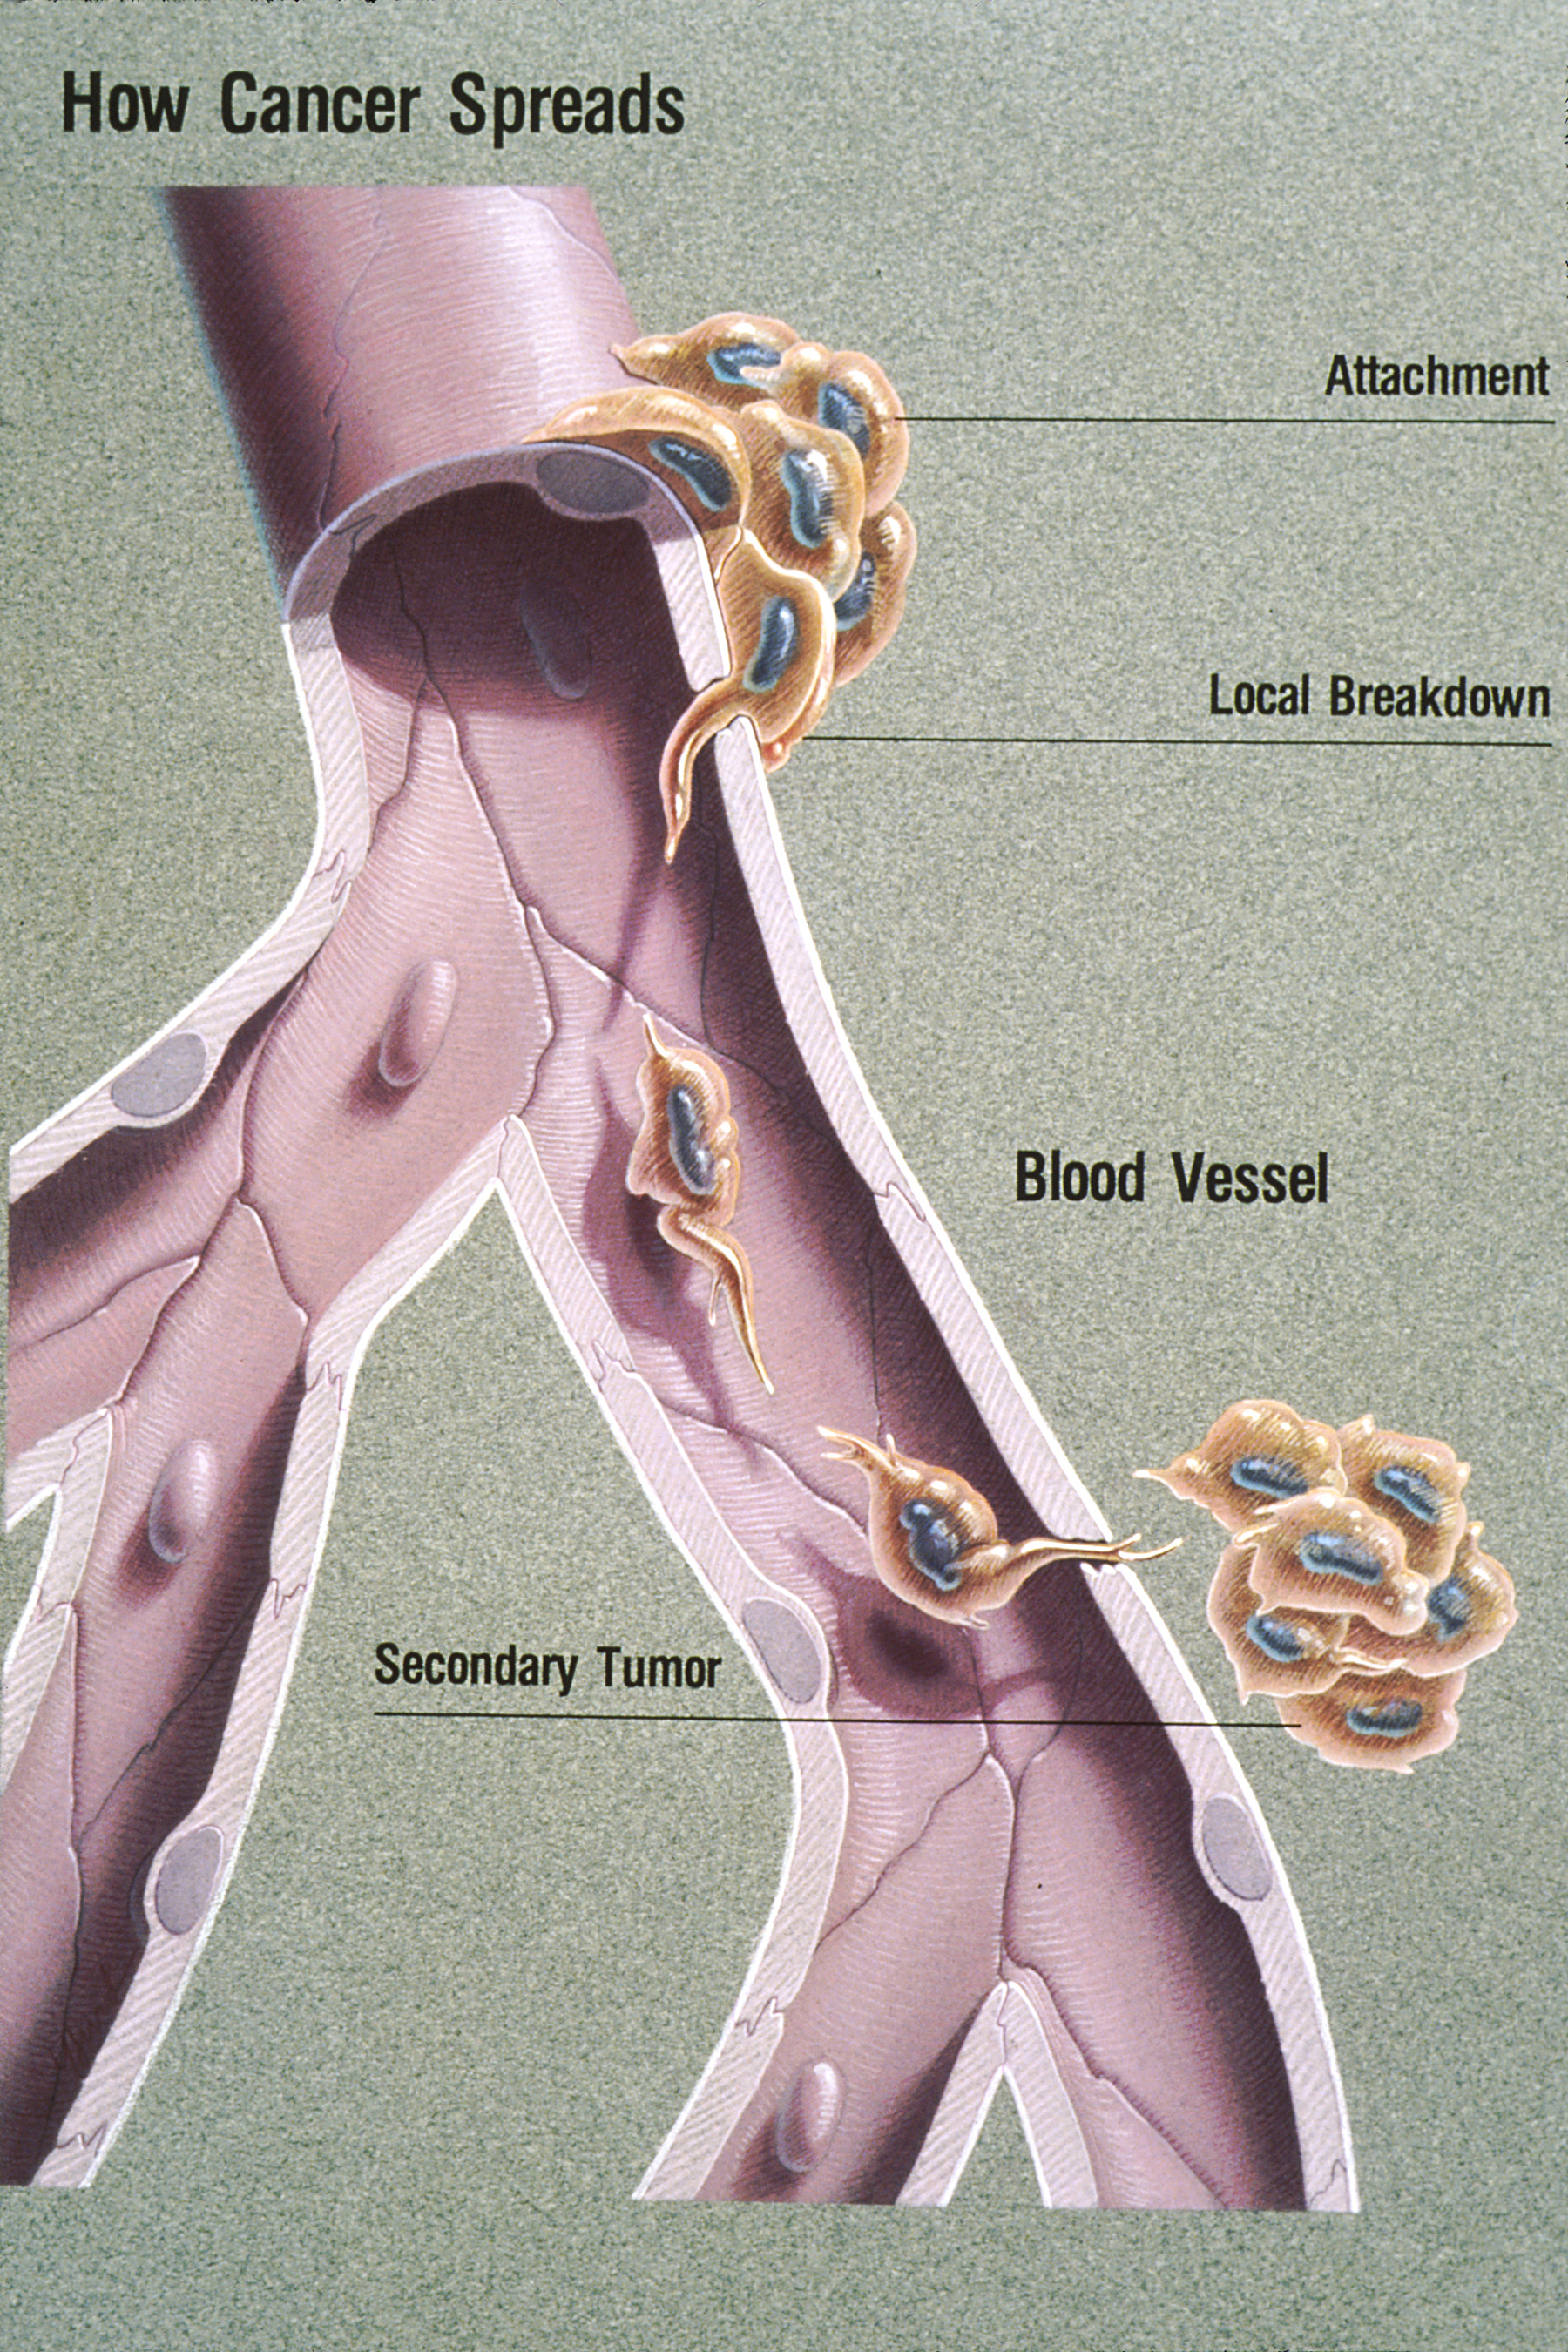 metastatic cancer dangerous